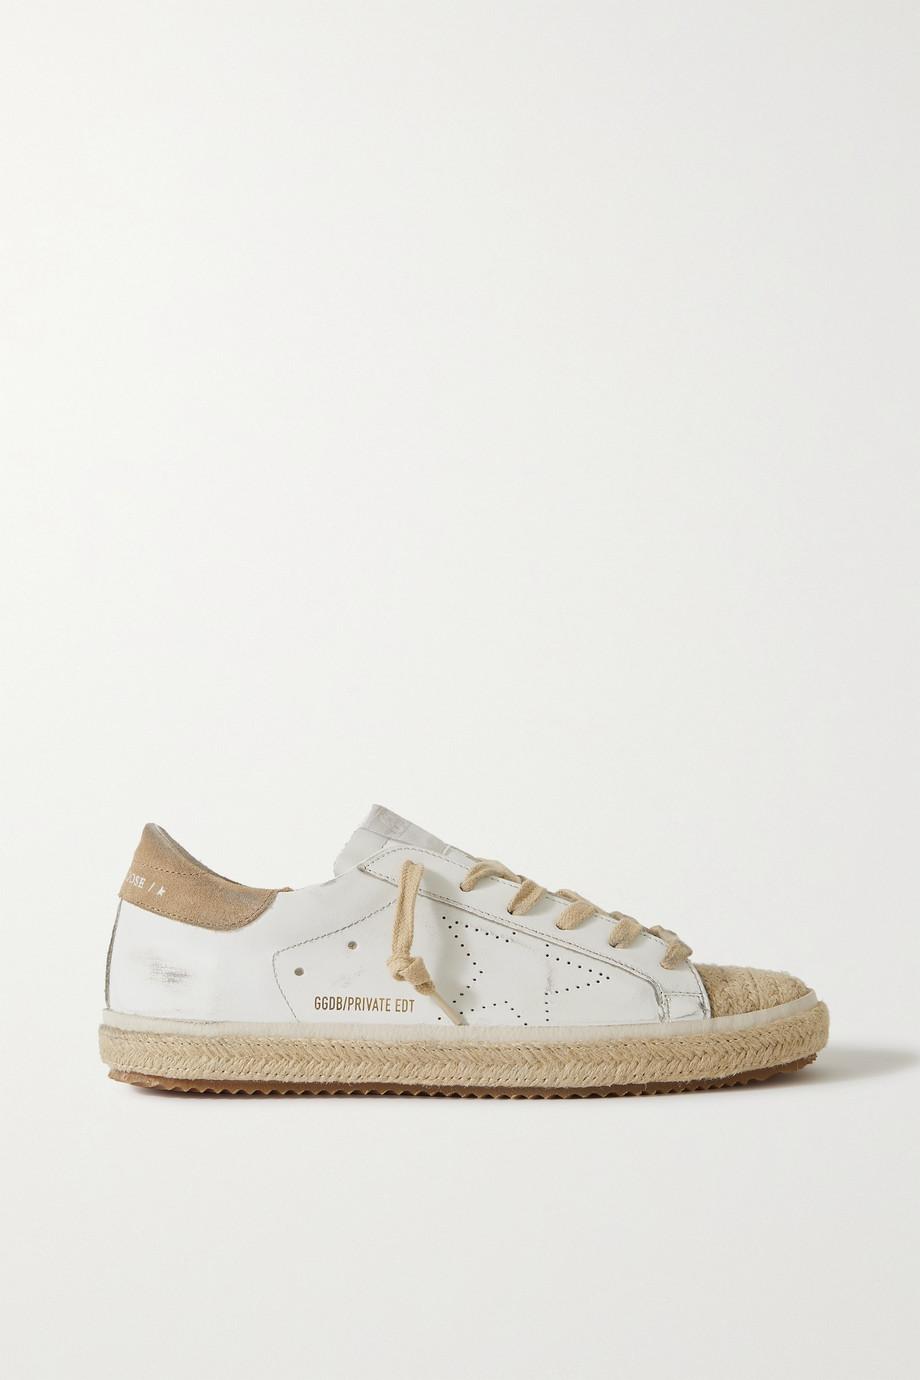 Golden Goose Superstar distressed suede-trimmed leather espadrille sneakers